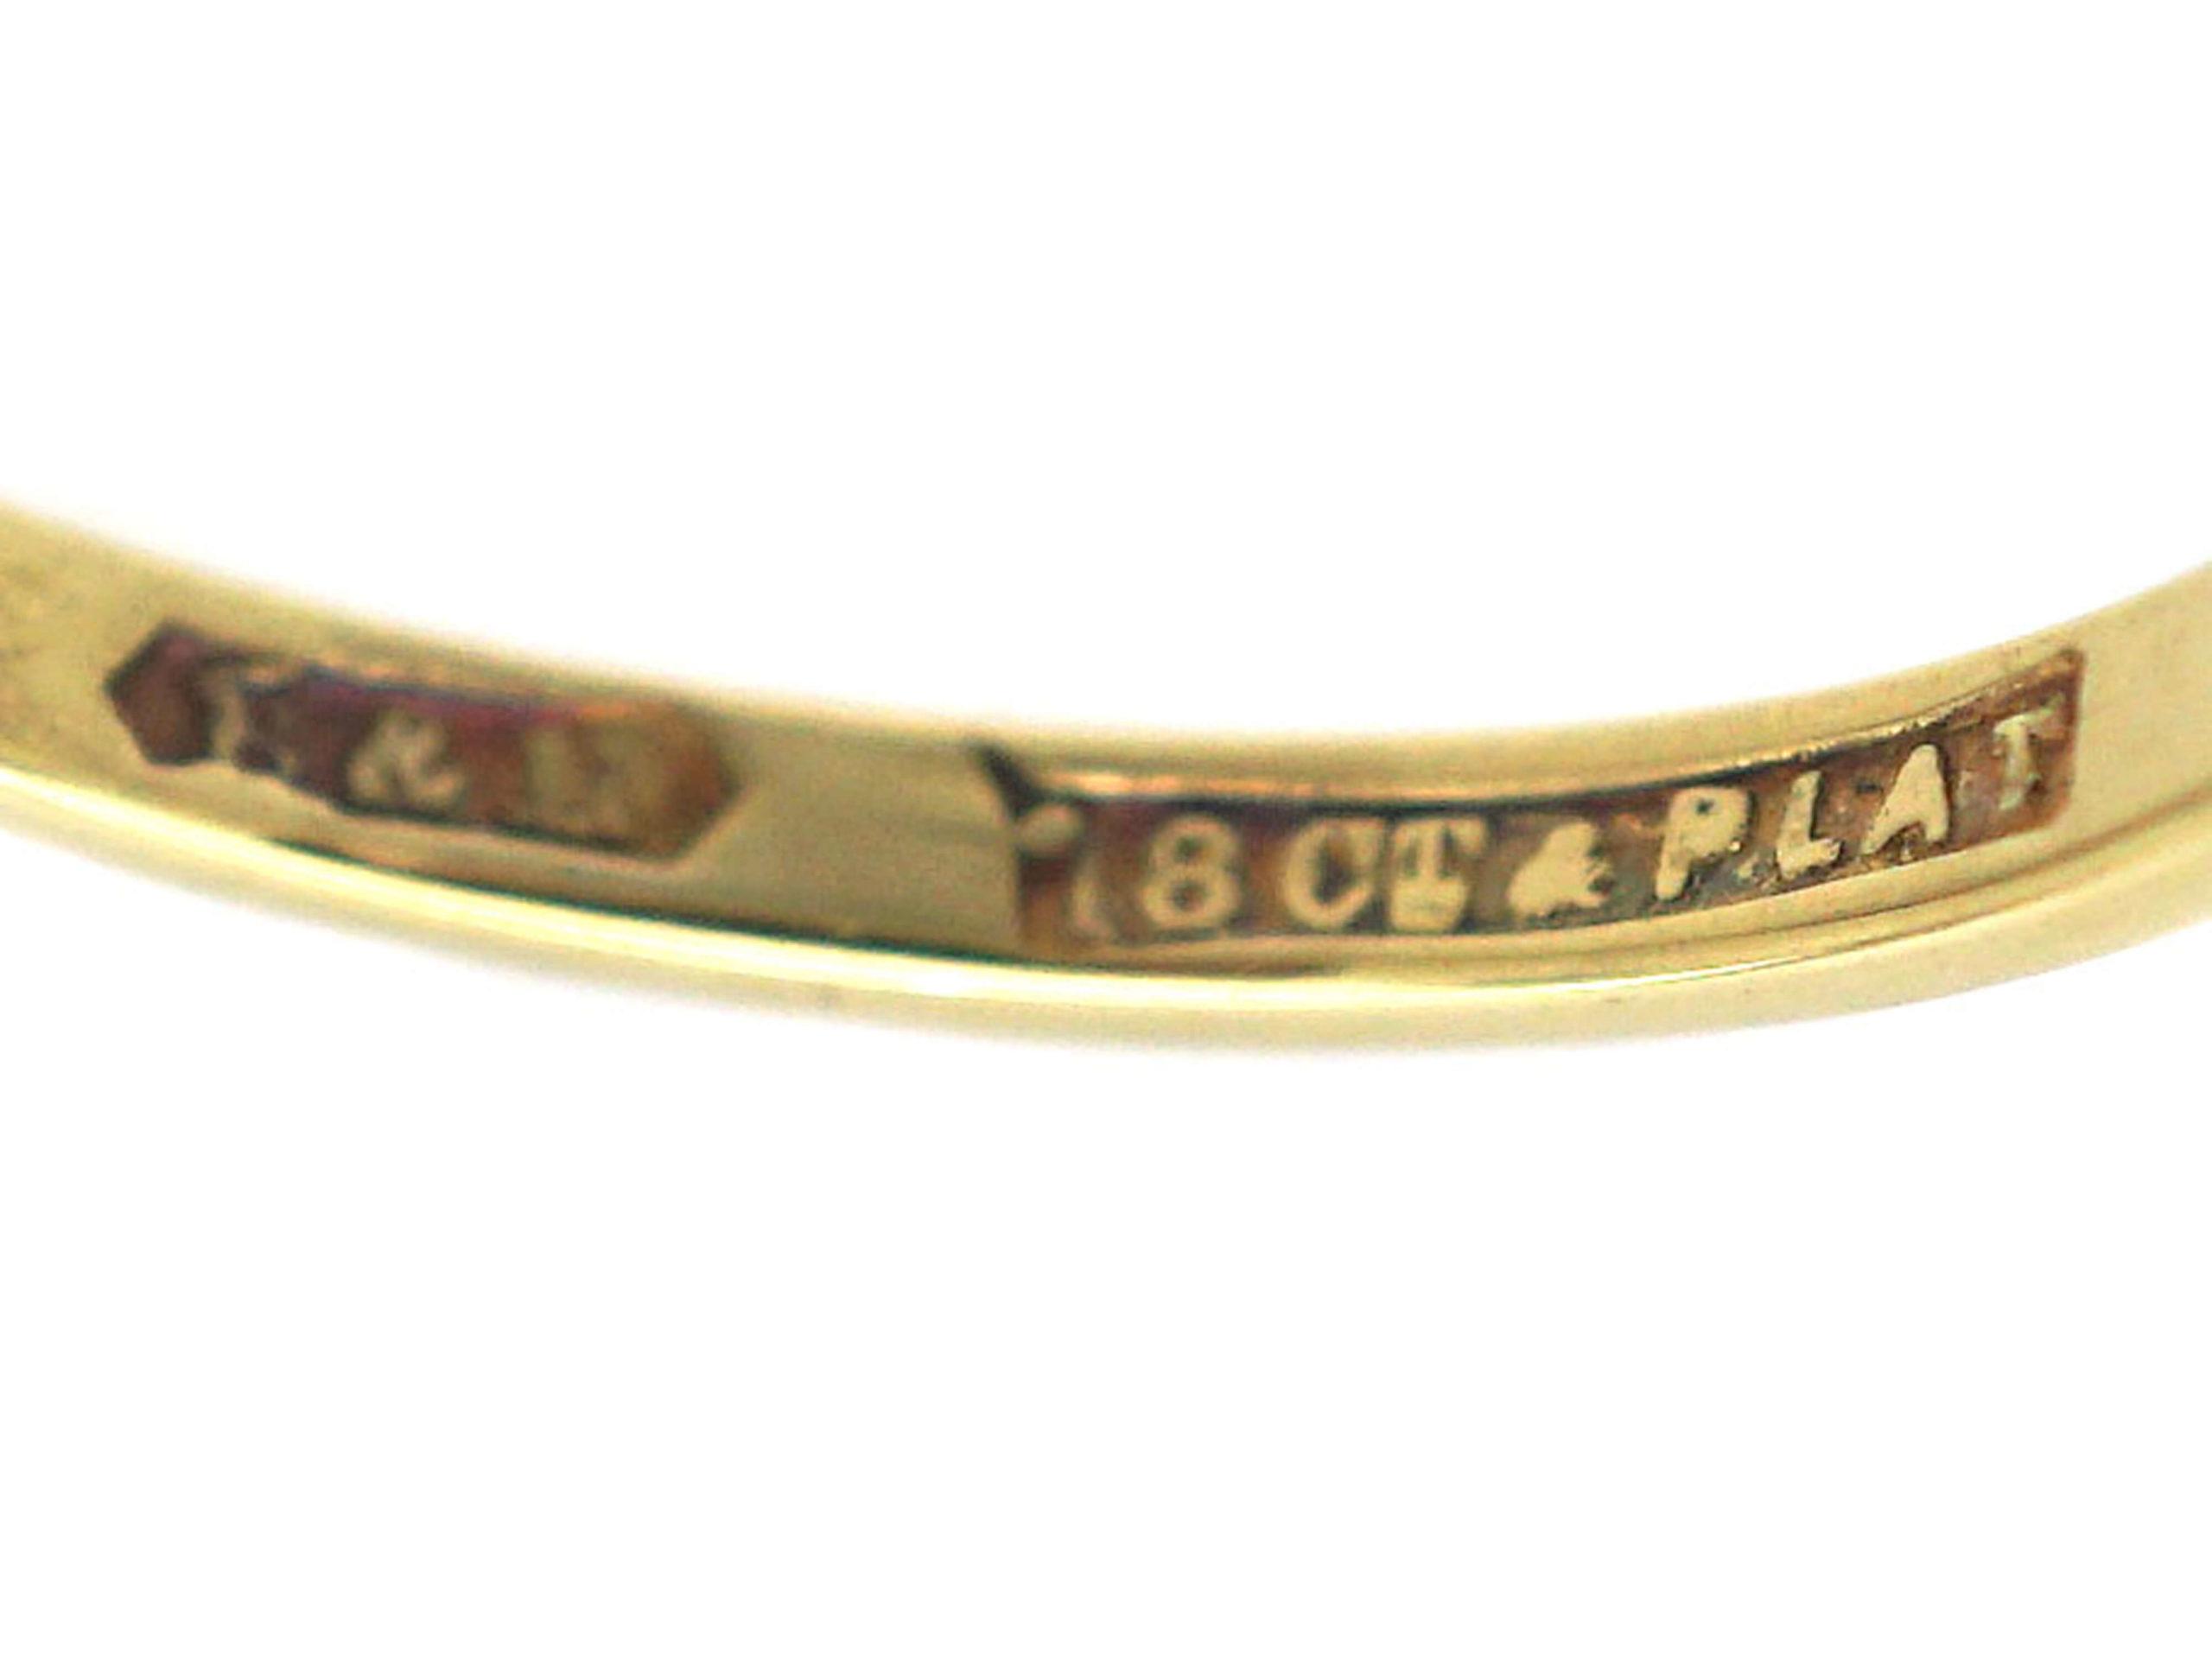 Art Deco 18ct Gold & Platinum, Diamond Solitaire Ring with Rose Diamond Set Shoulders